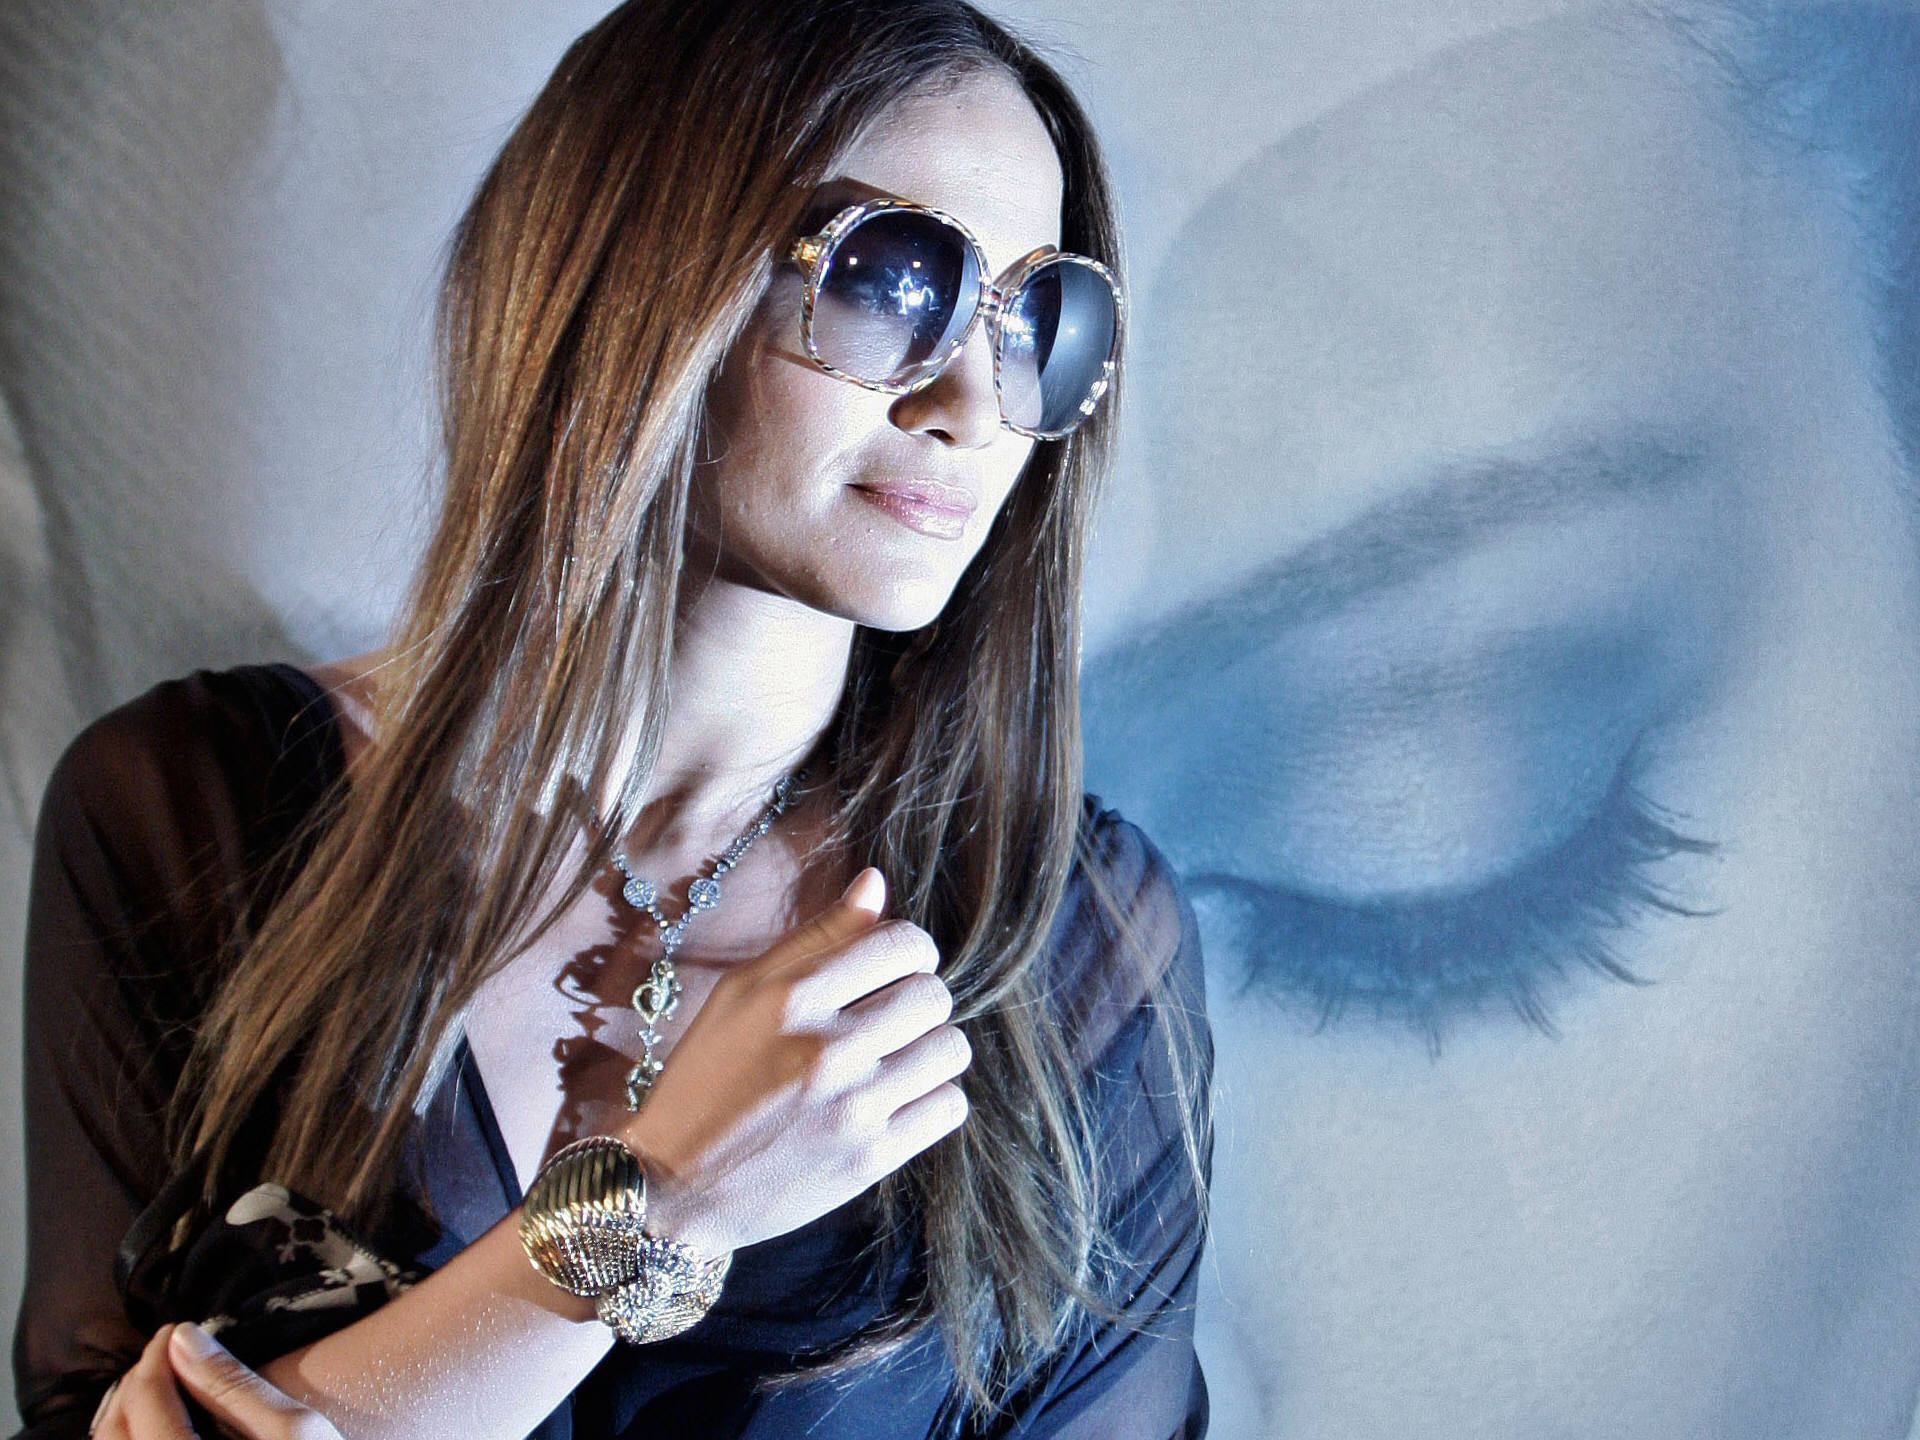 Jennifer Lopez 2013 - 1920x1440